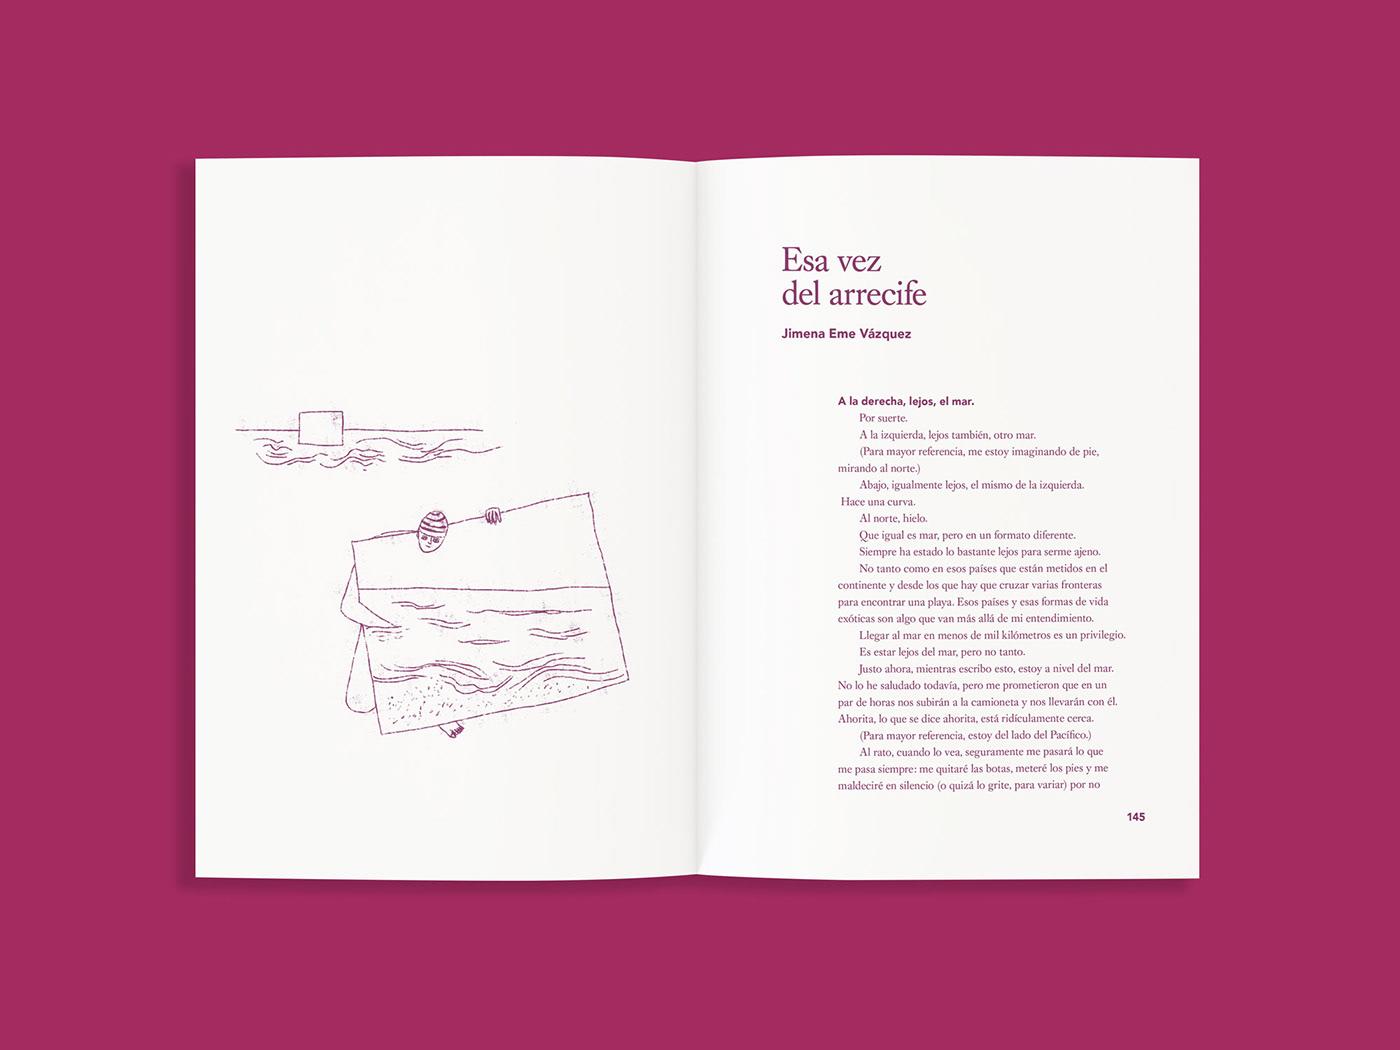 book cuento dibujo Drawing  Duotone ensayo nada nadar Pool swimming pool